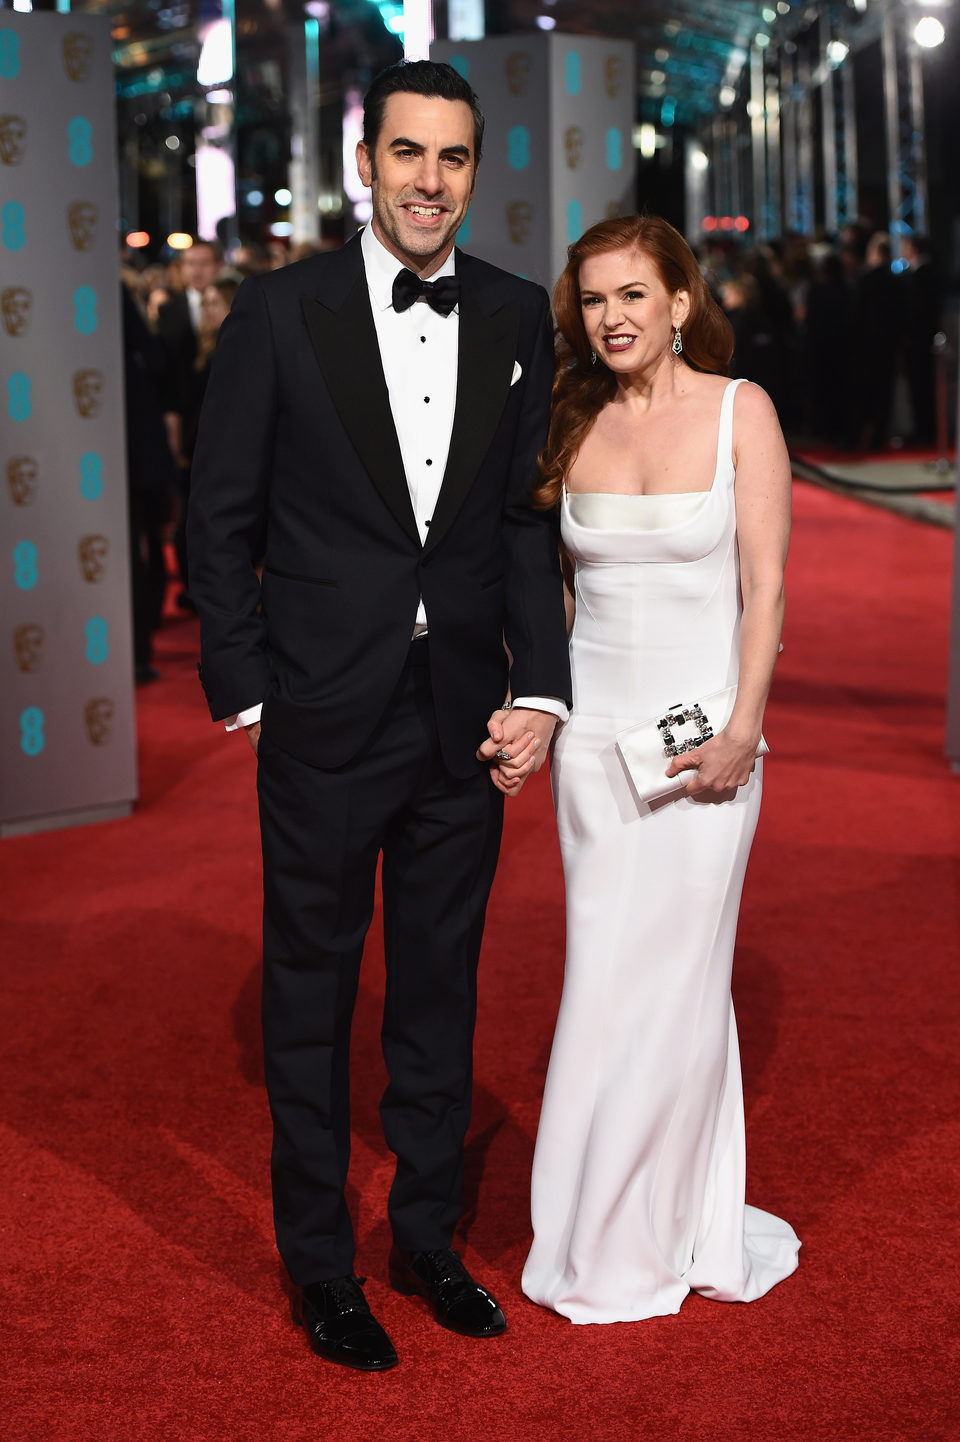 Sacha Baron Cohen e Isla Fisher en la alfombra roja de los BAFTA Awards 2016